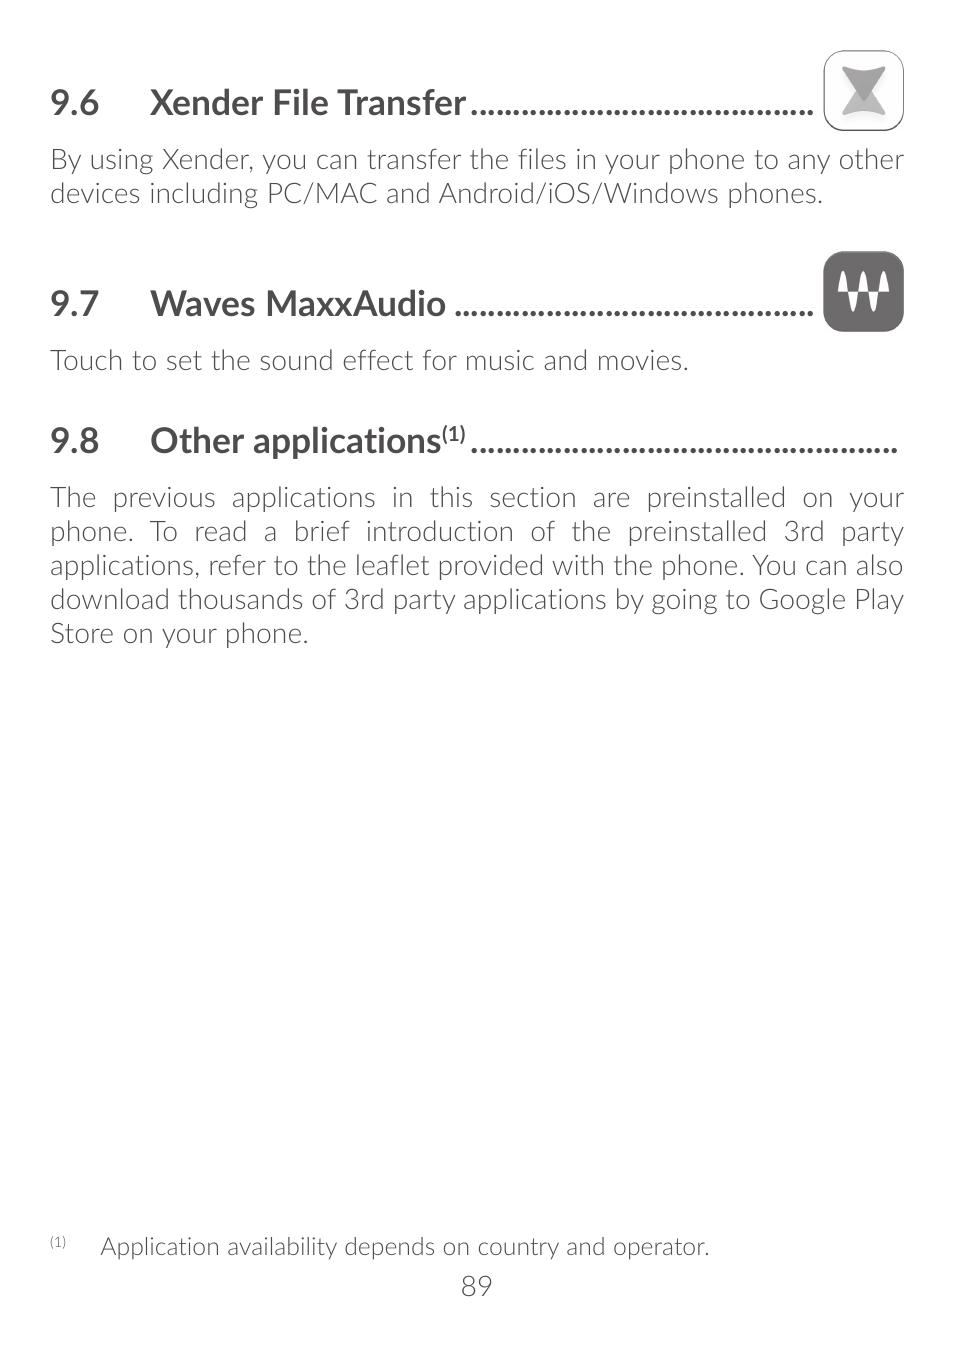 MAXXAUDIO TÉLÉCHARGER WAVES